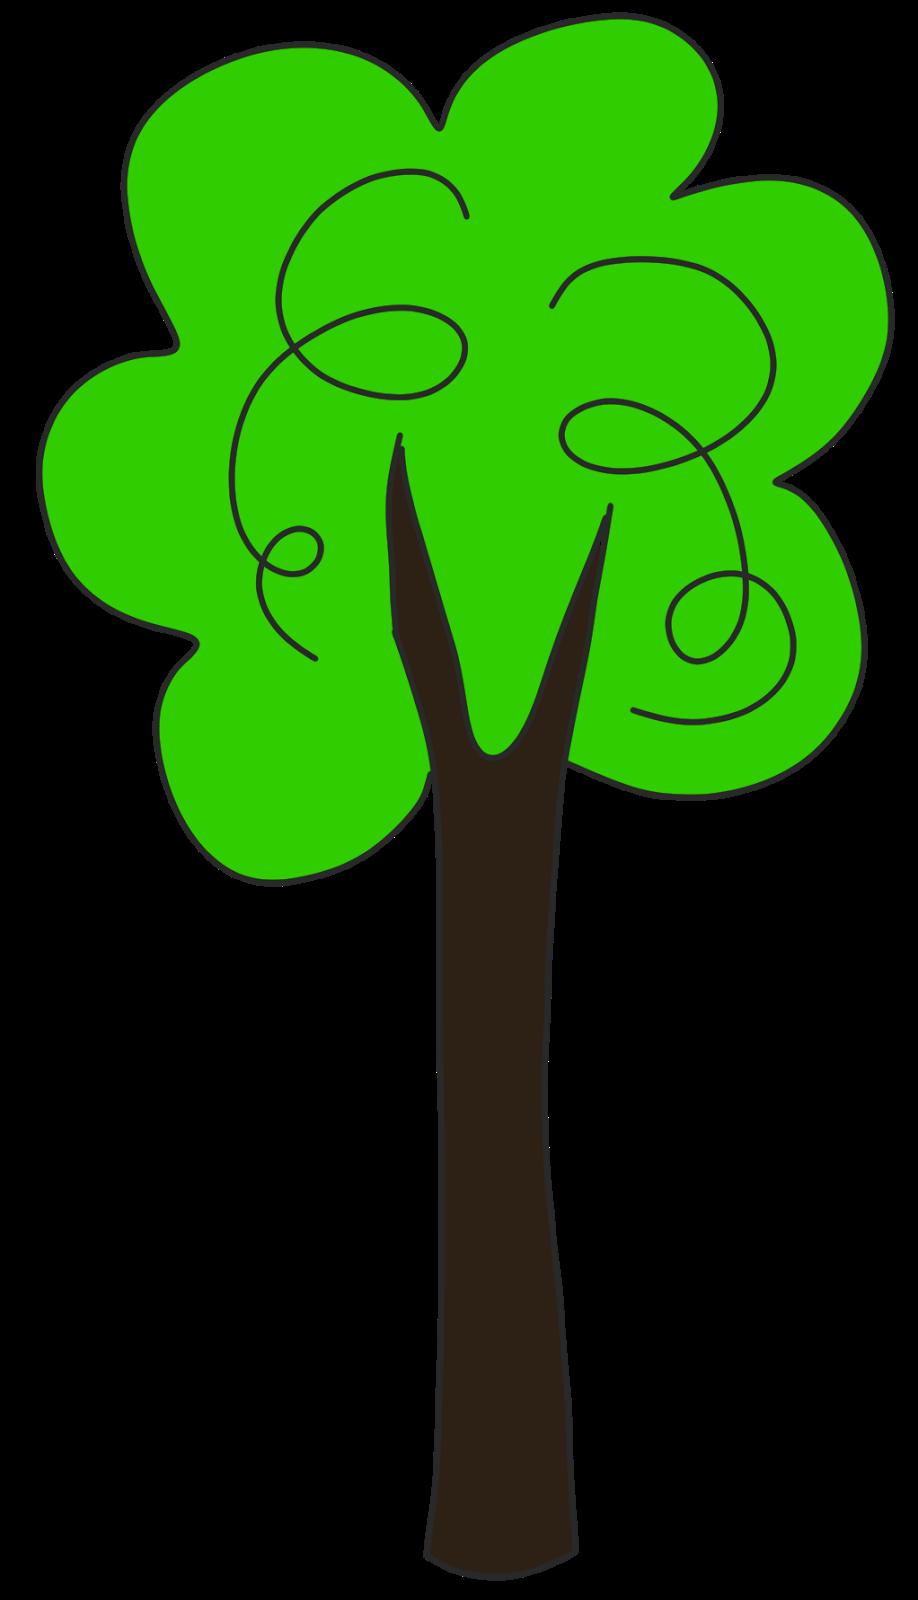 Shade tree clipart image black and white stock cartoon tall thin tree clipart - Clipground image black and white stock